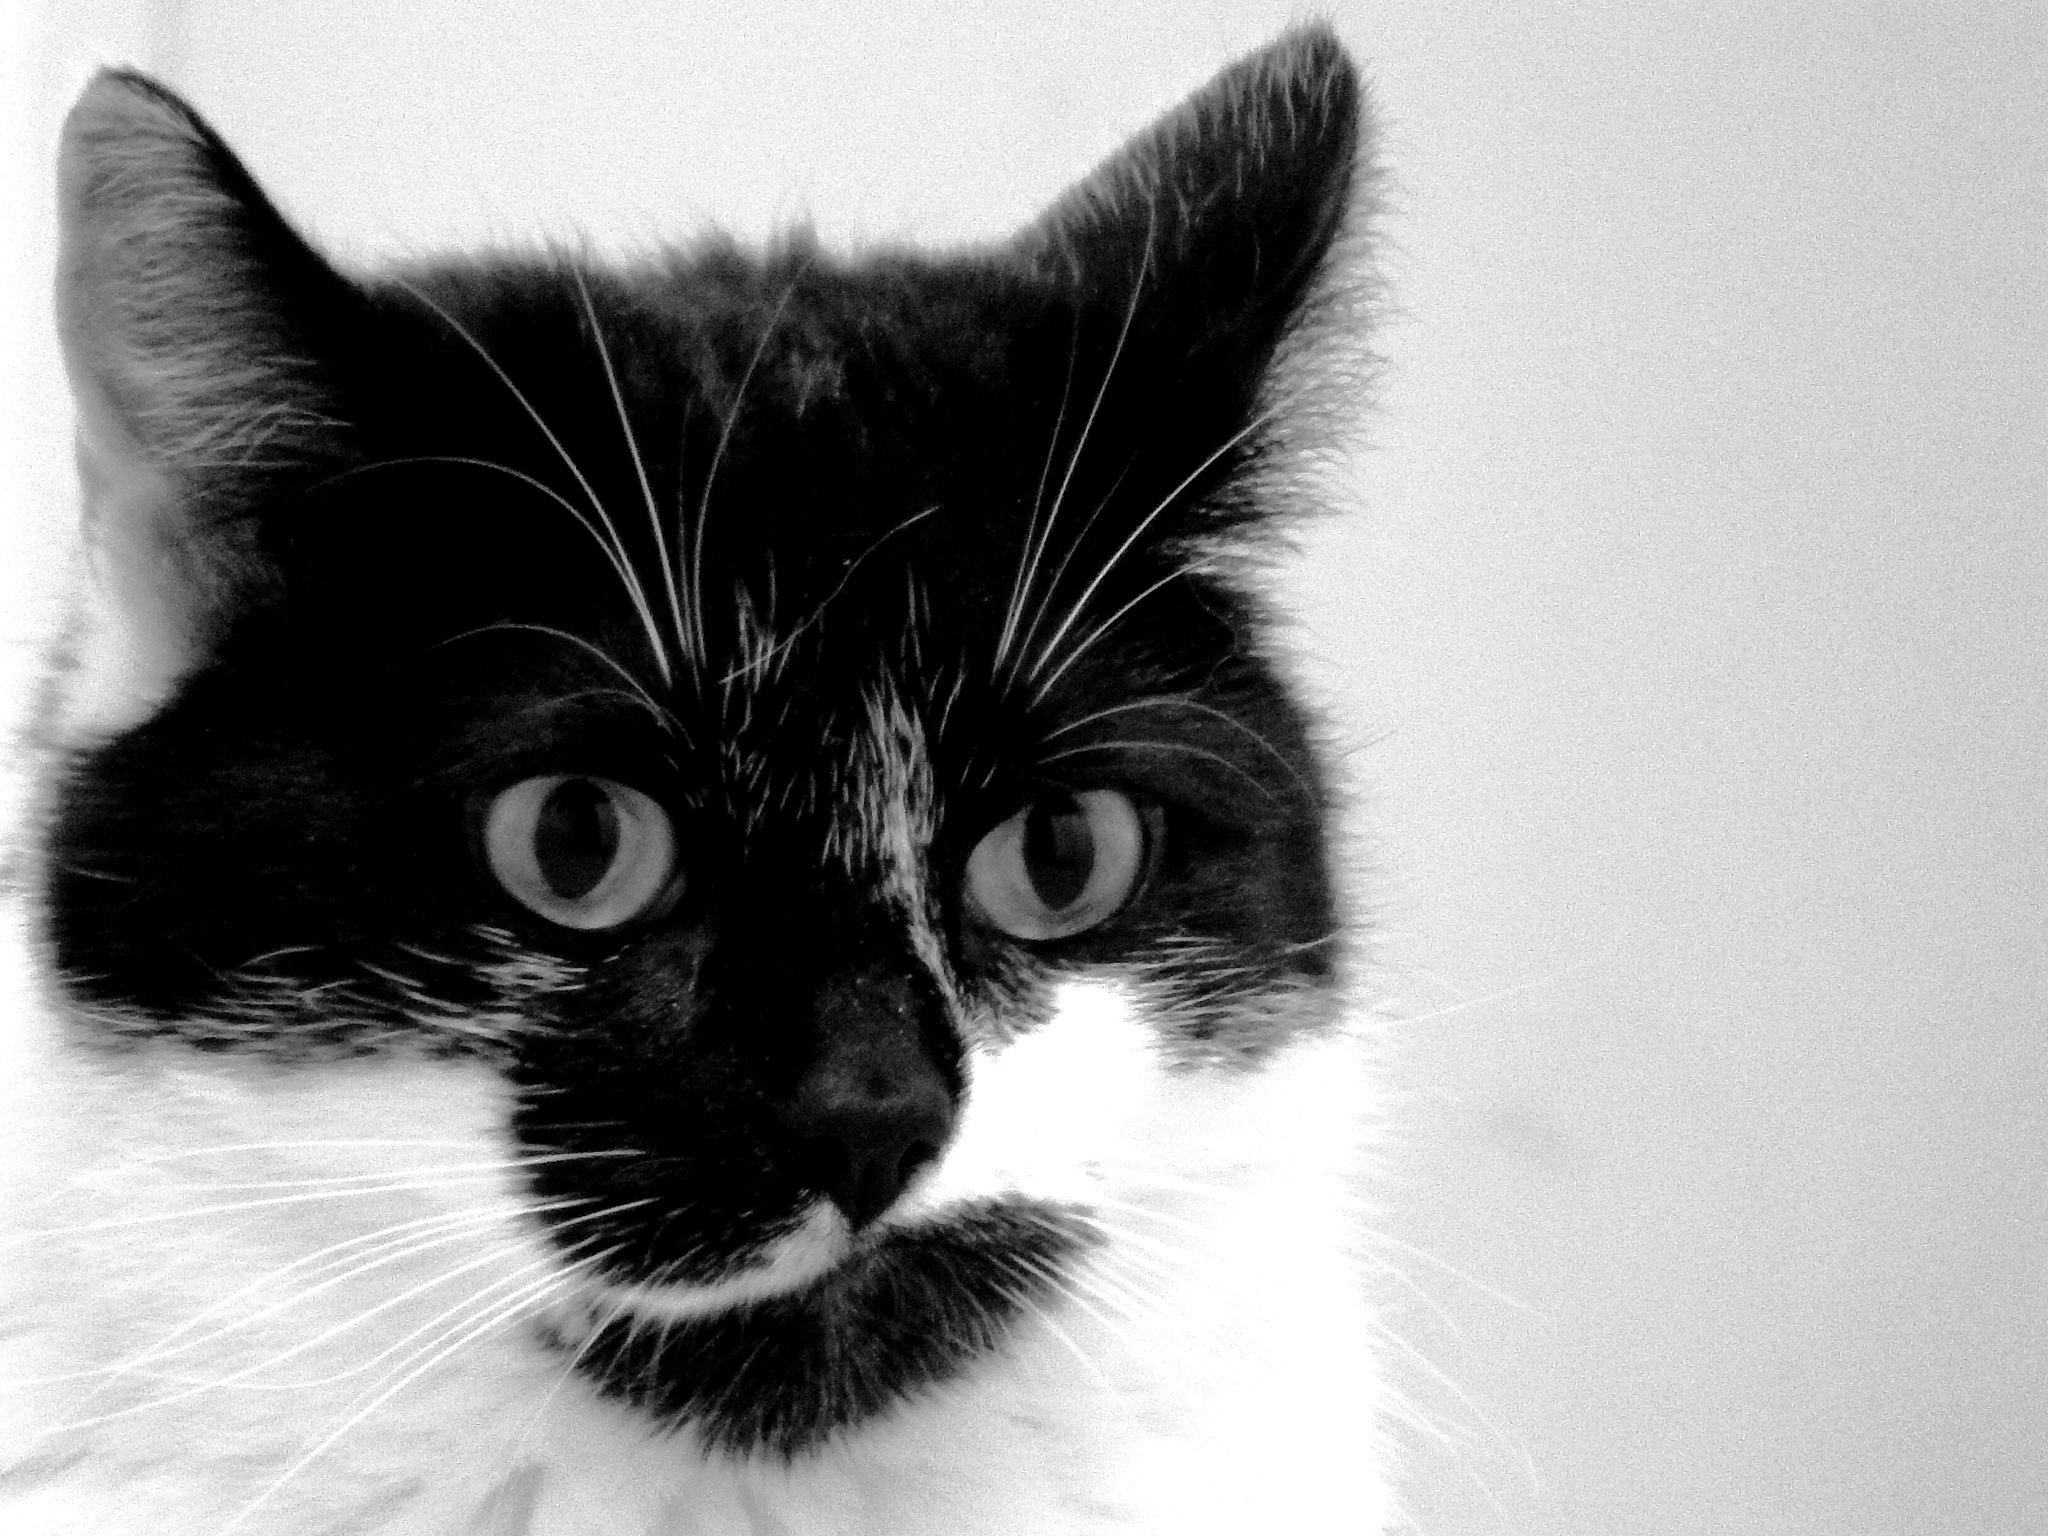 cat portrait by kot_pachinko